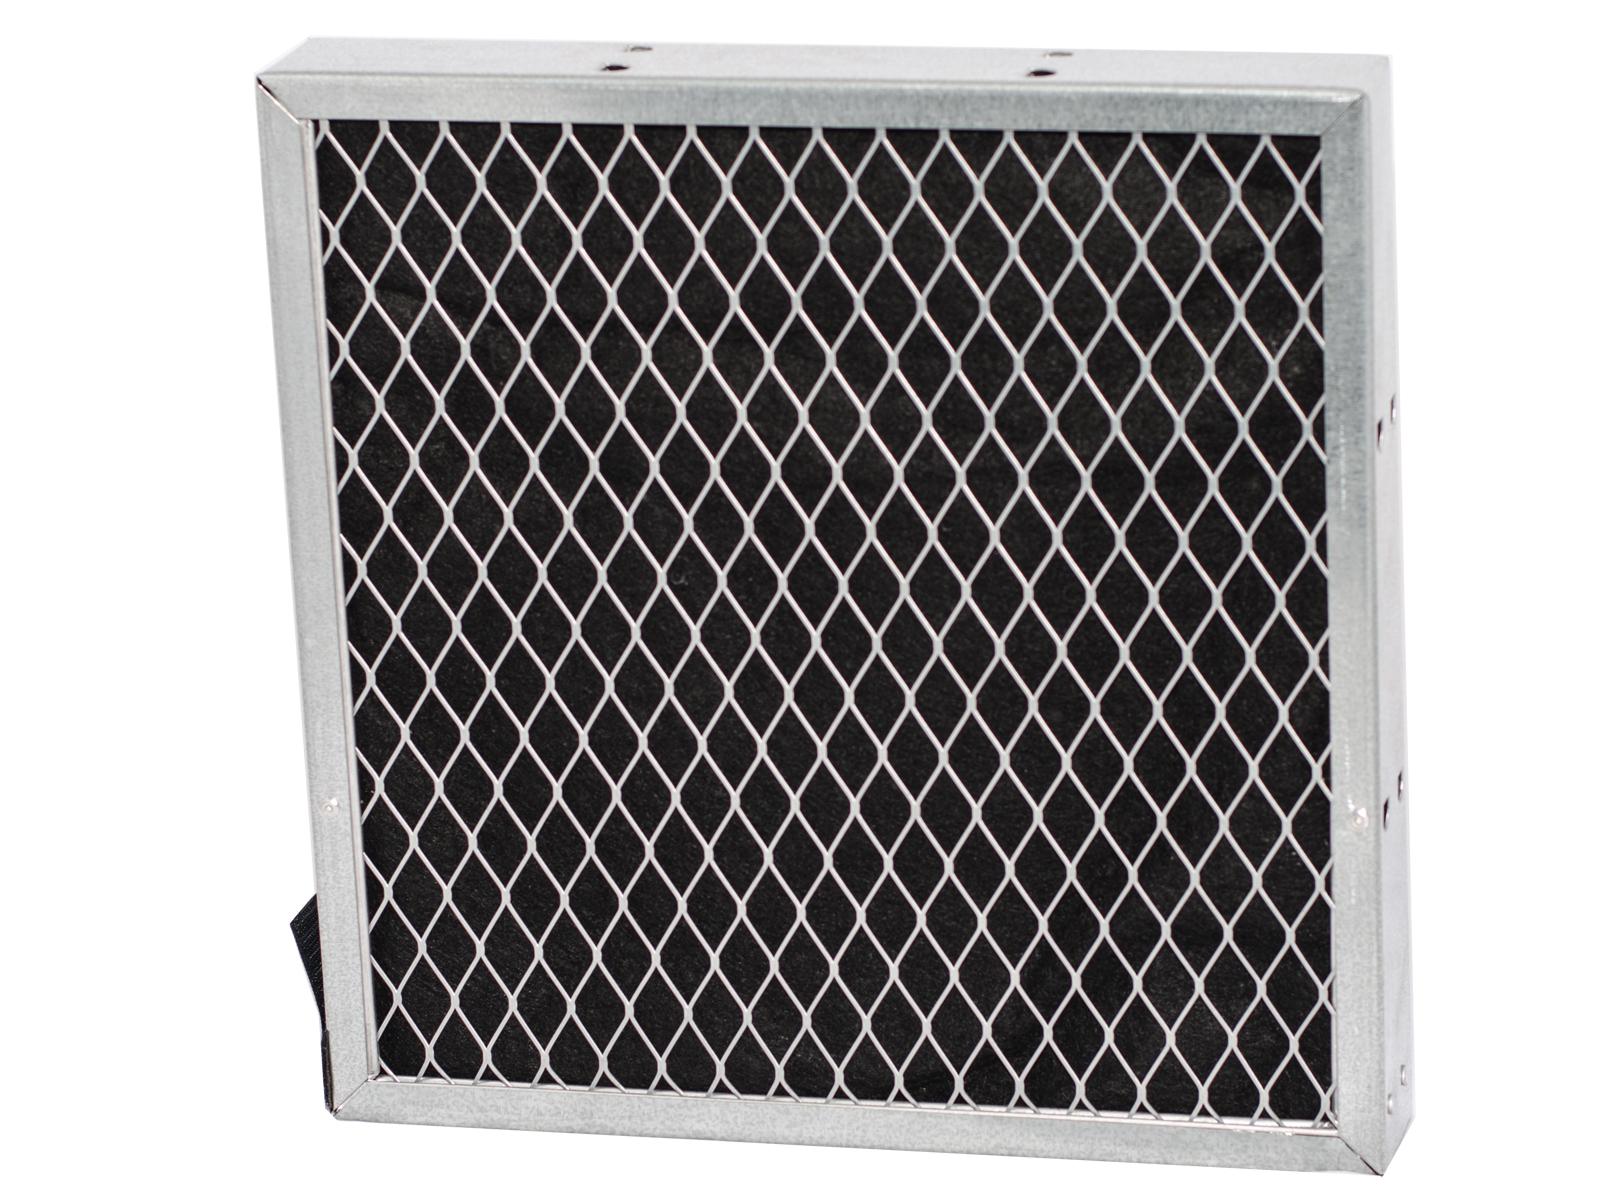 DustPlus Carbon Air Filter